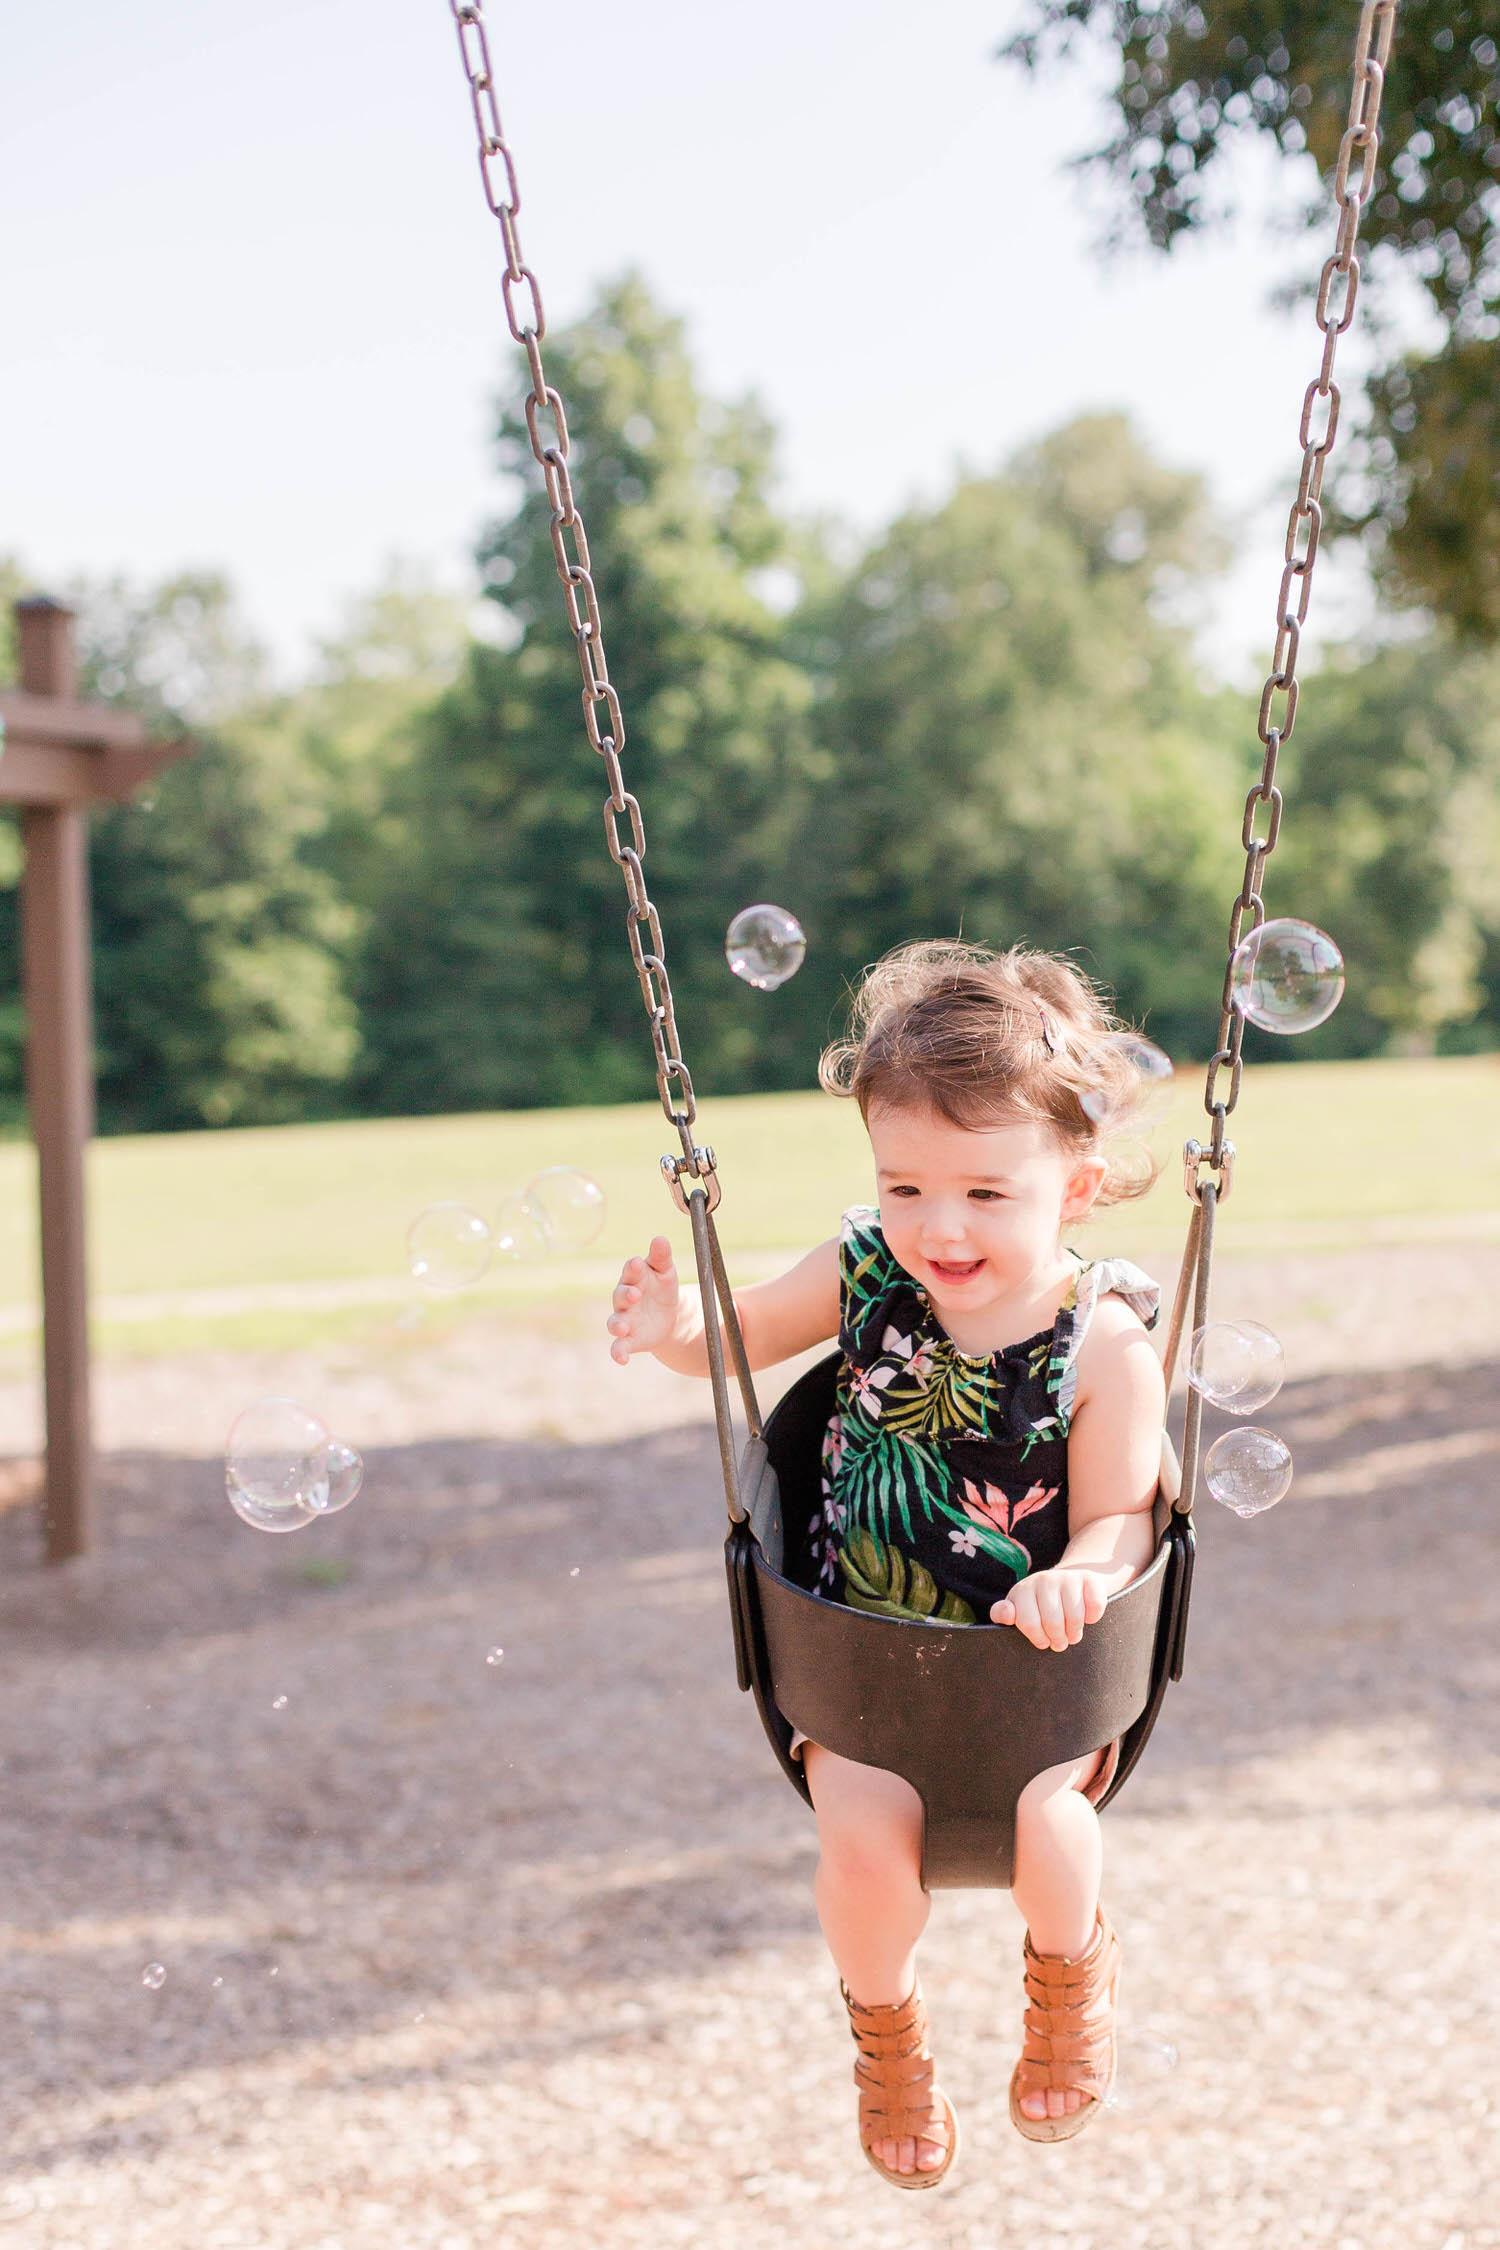 Ashley-AMBER-Photo-Greenville-Family-Photographer-170628-2.jpg